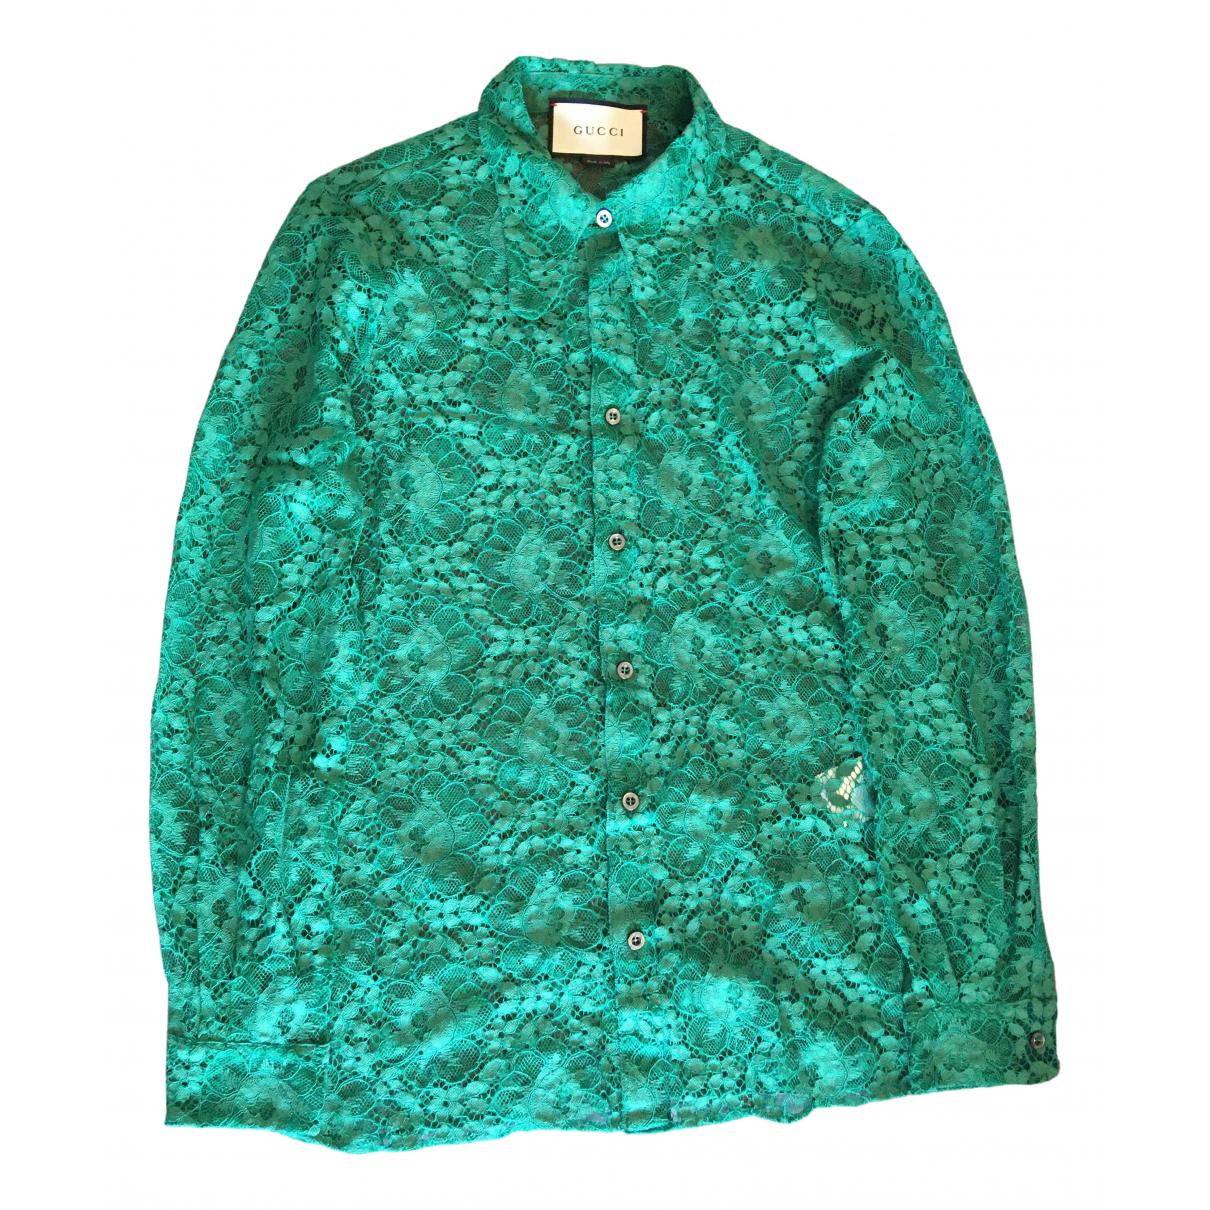 Gucci \N Green Cotton Shirts for Men S International